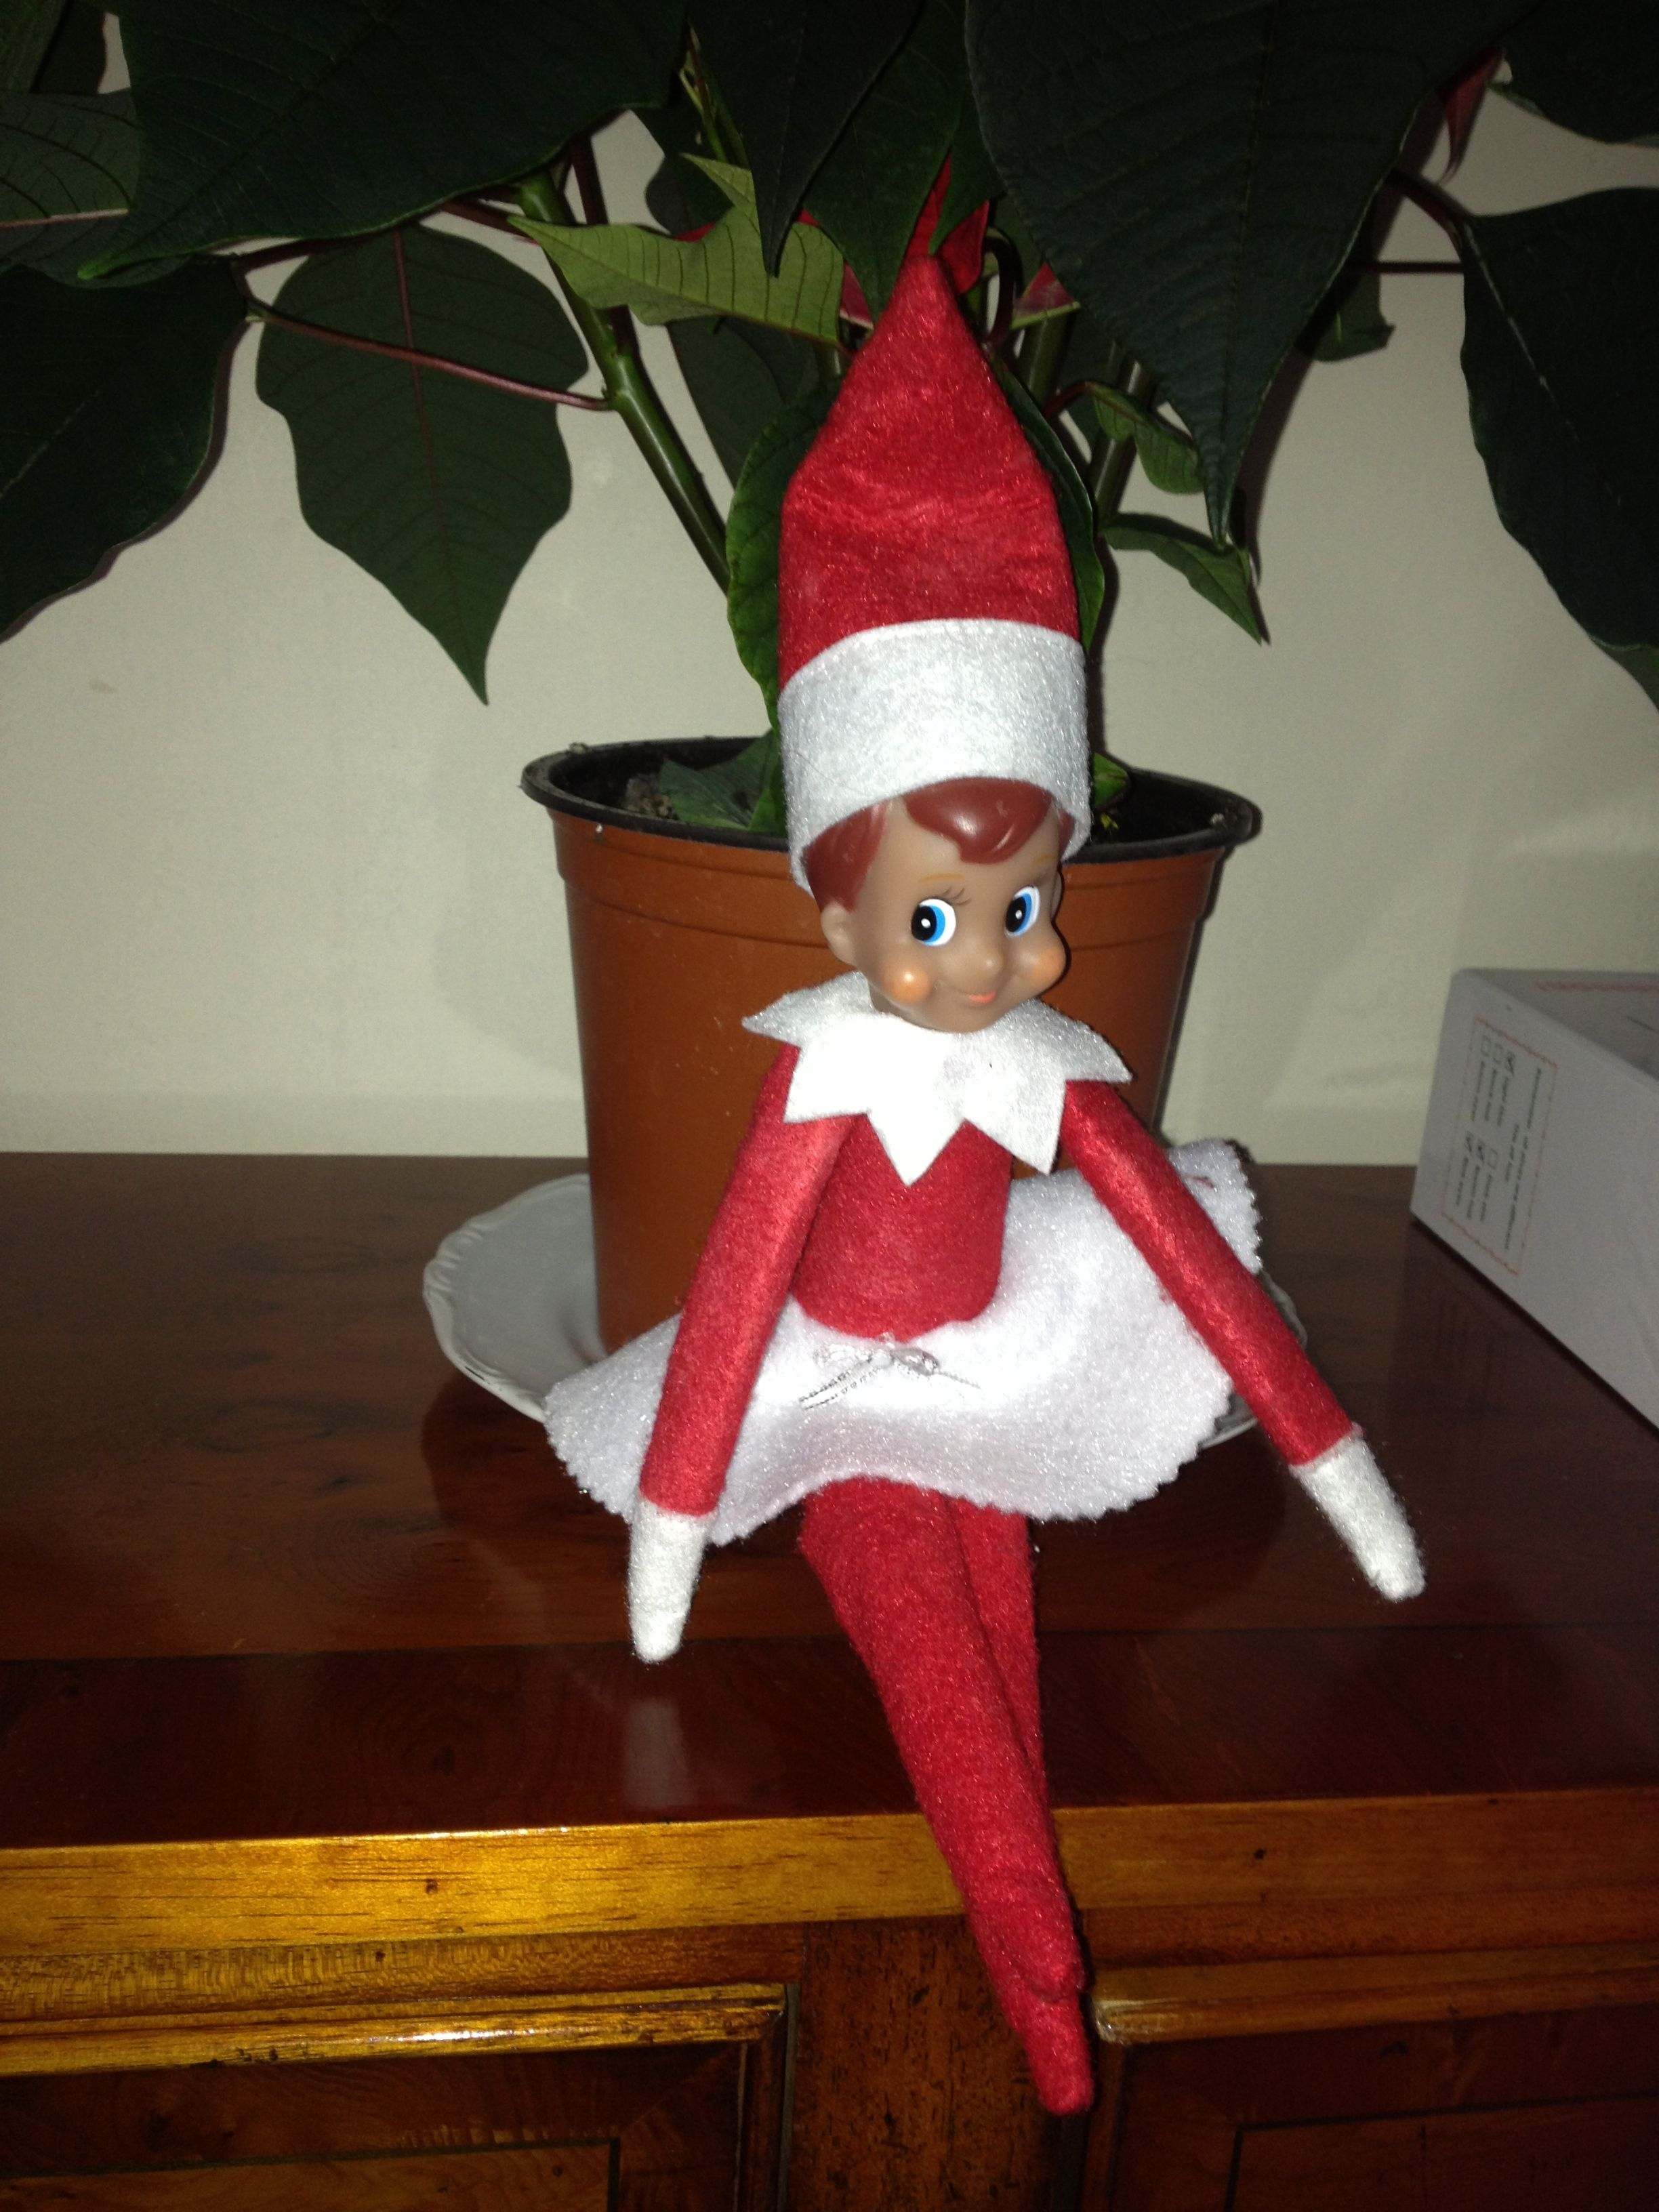 A Disc Of White Felt Turns A Boy Elf On The Shelf Into A Girl